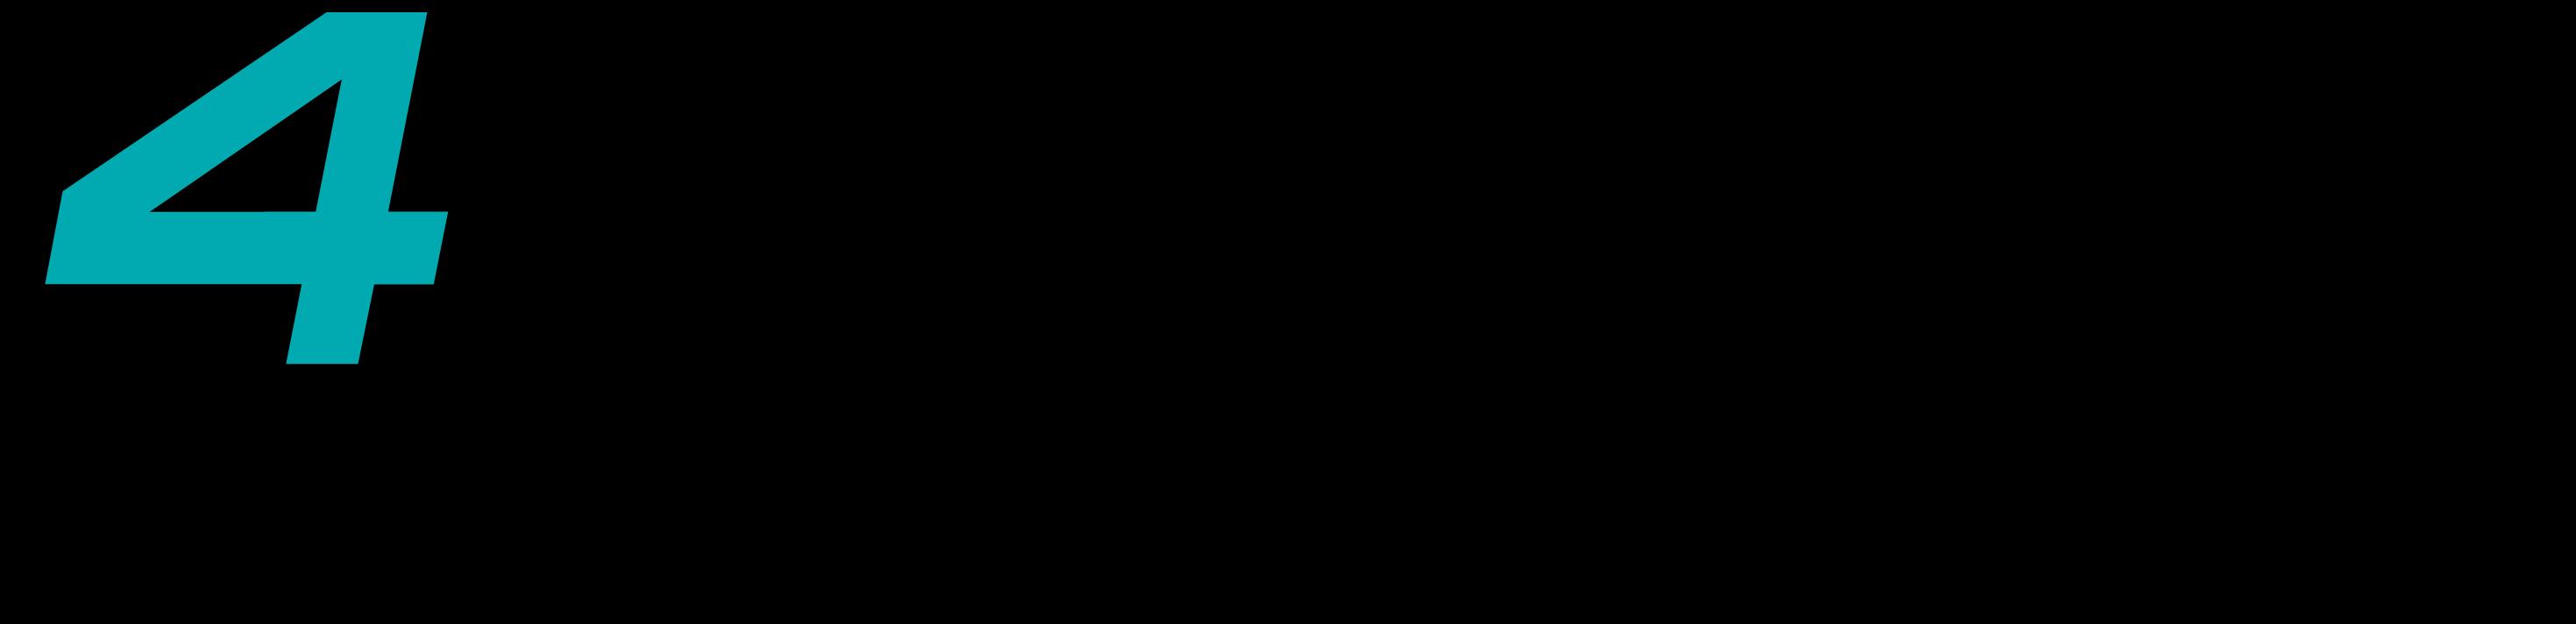 Consultoria e Suporte 4Linux